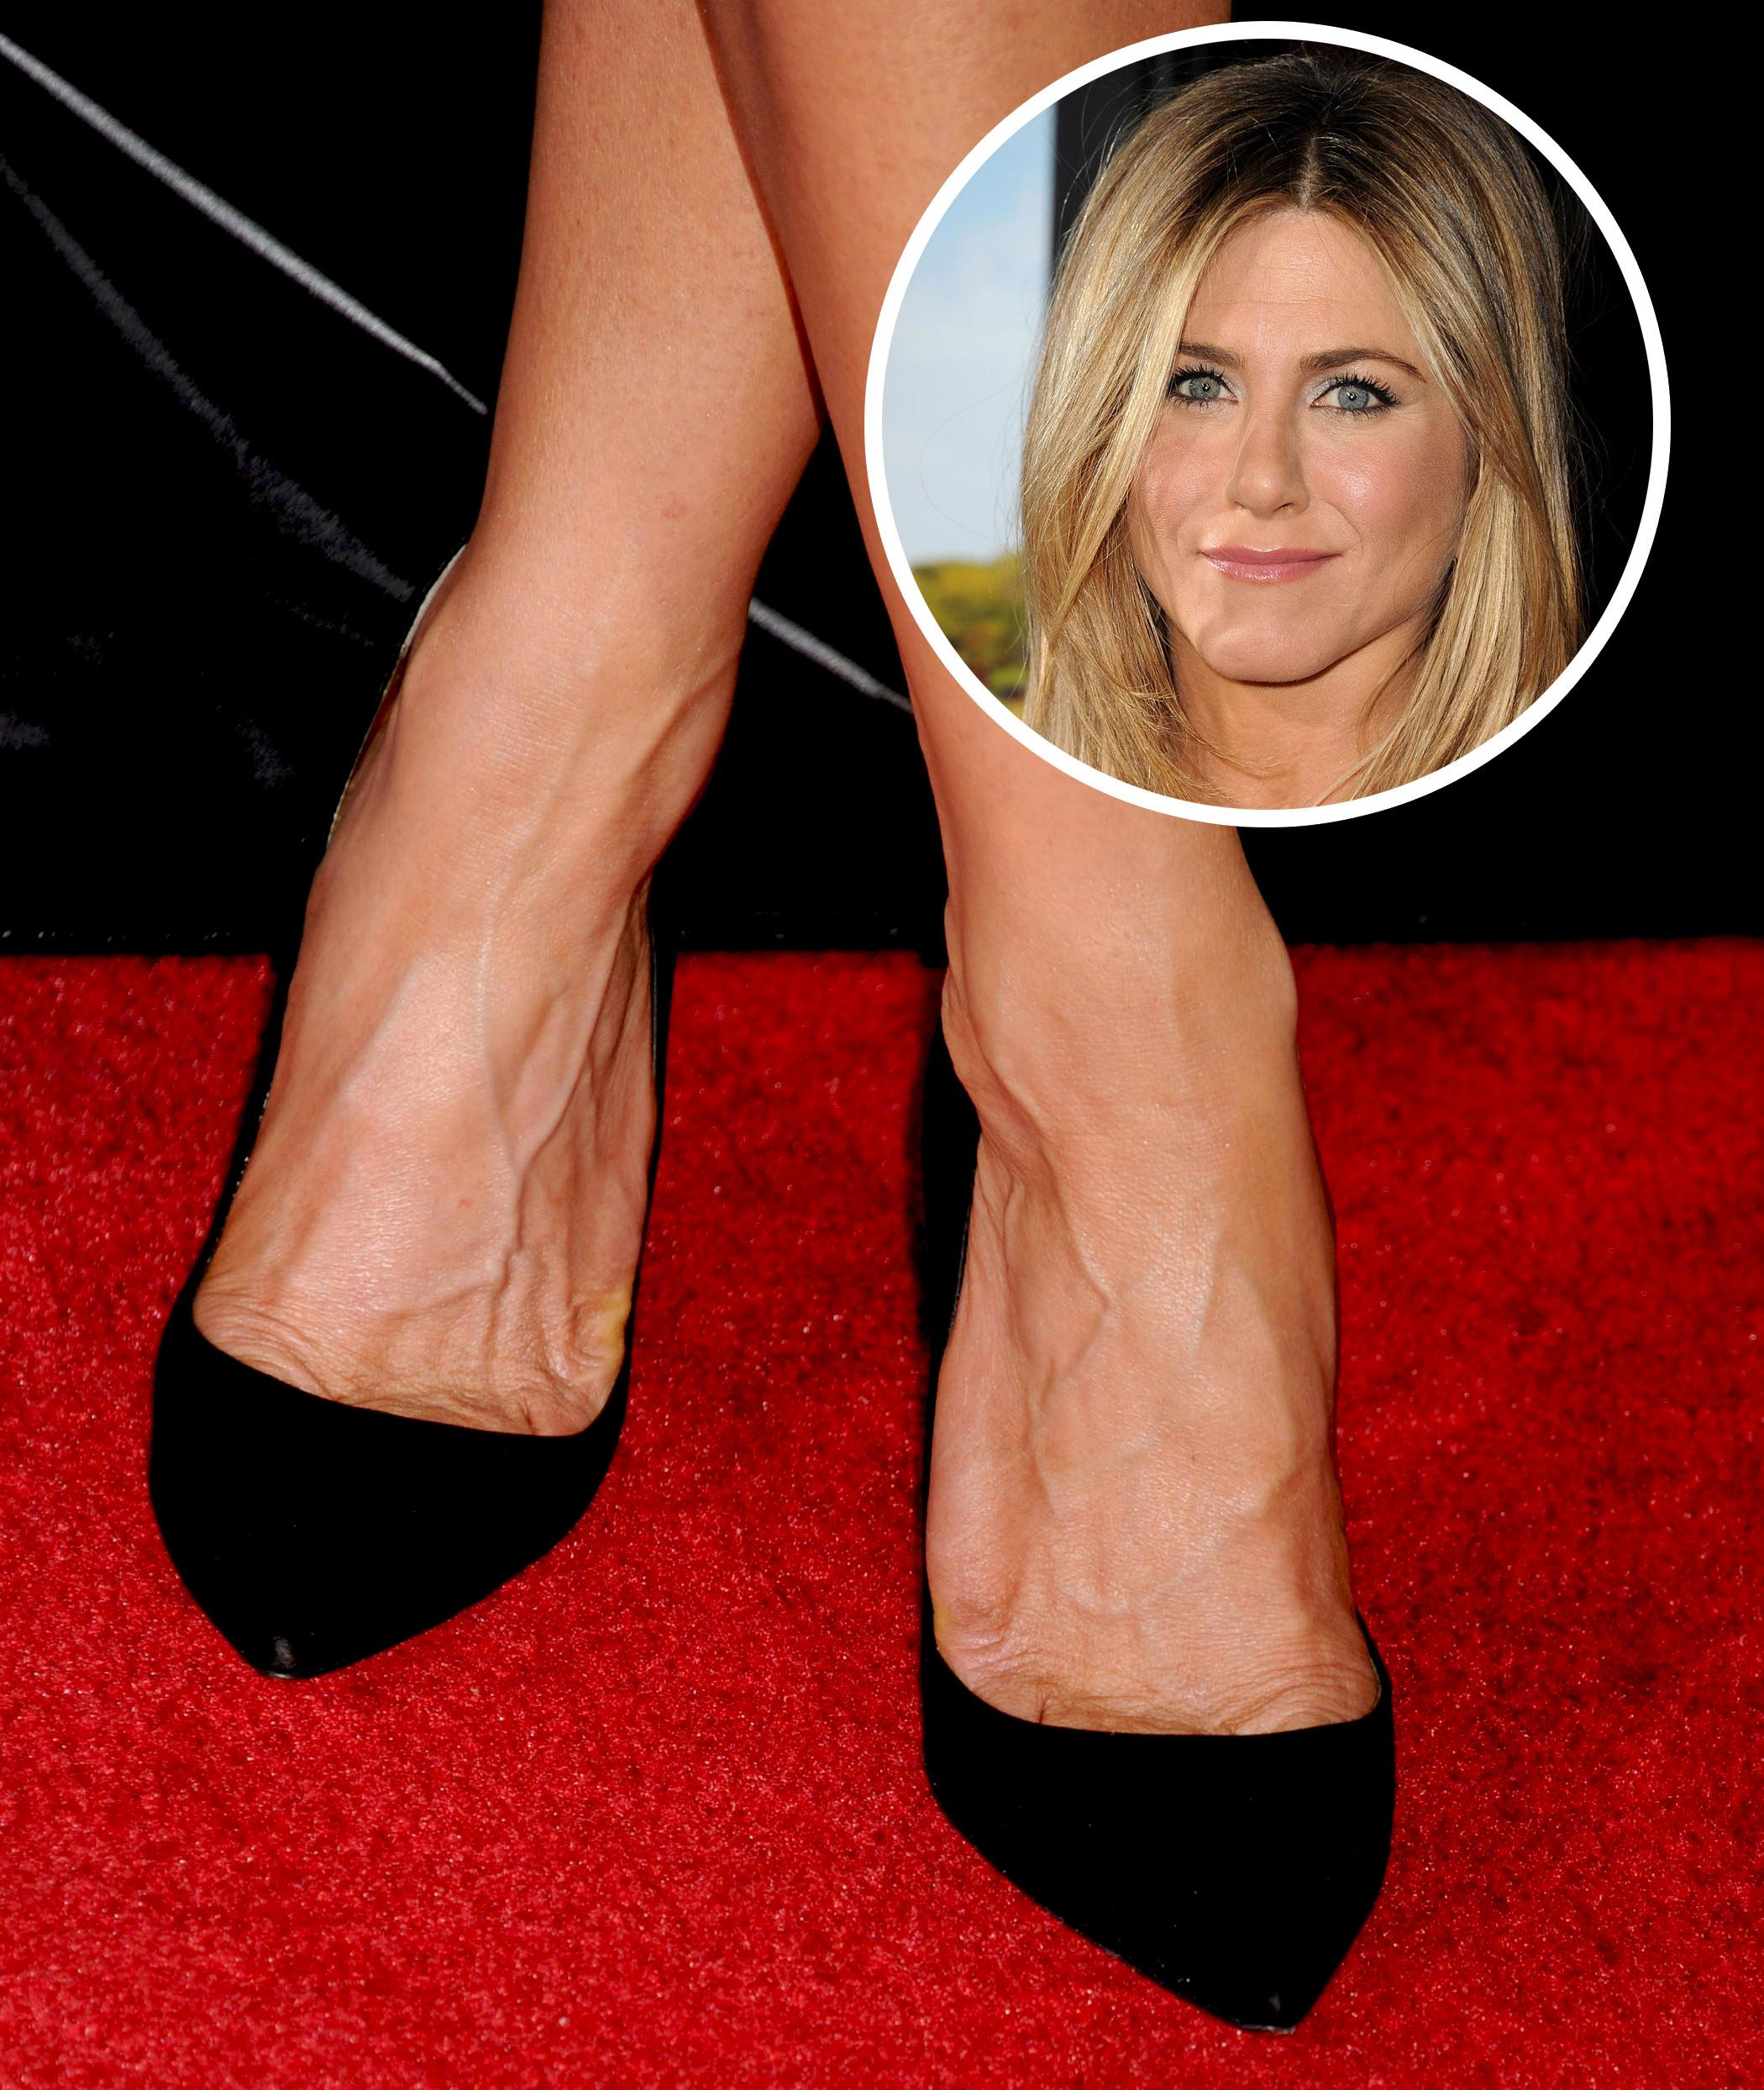 Jennifer aniston katie holmes and more stars with shockingly veiny feet life style - Jennifer aniston barefoot ...